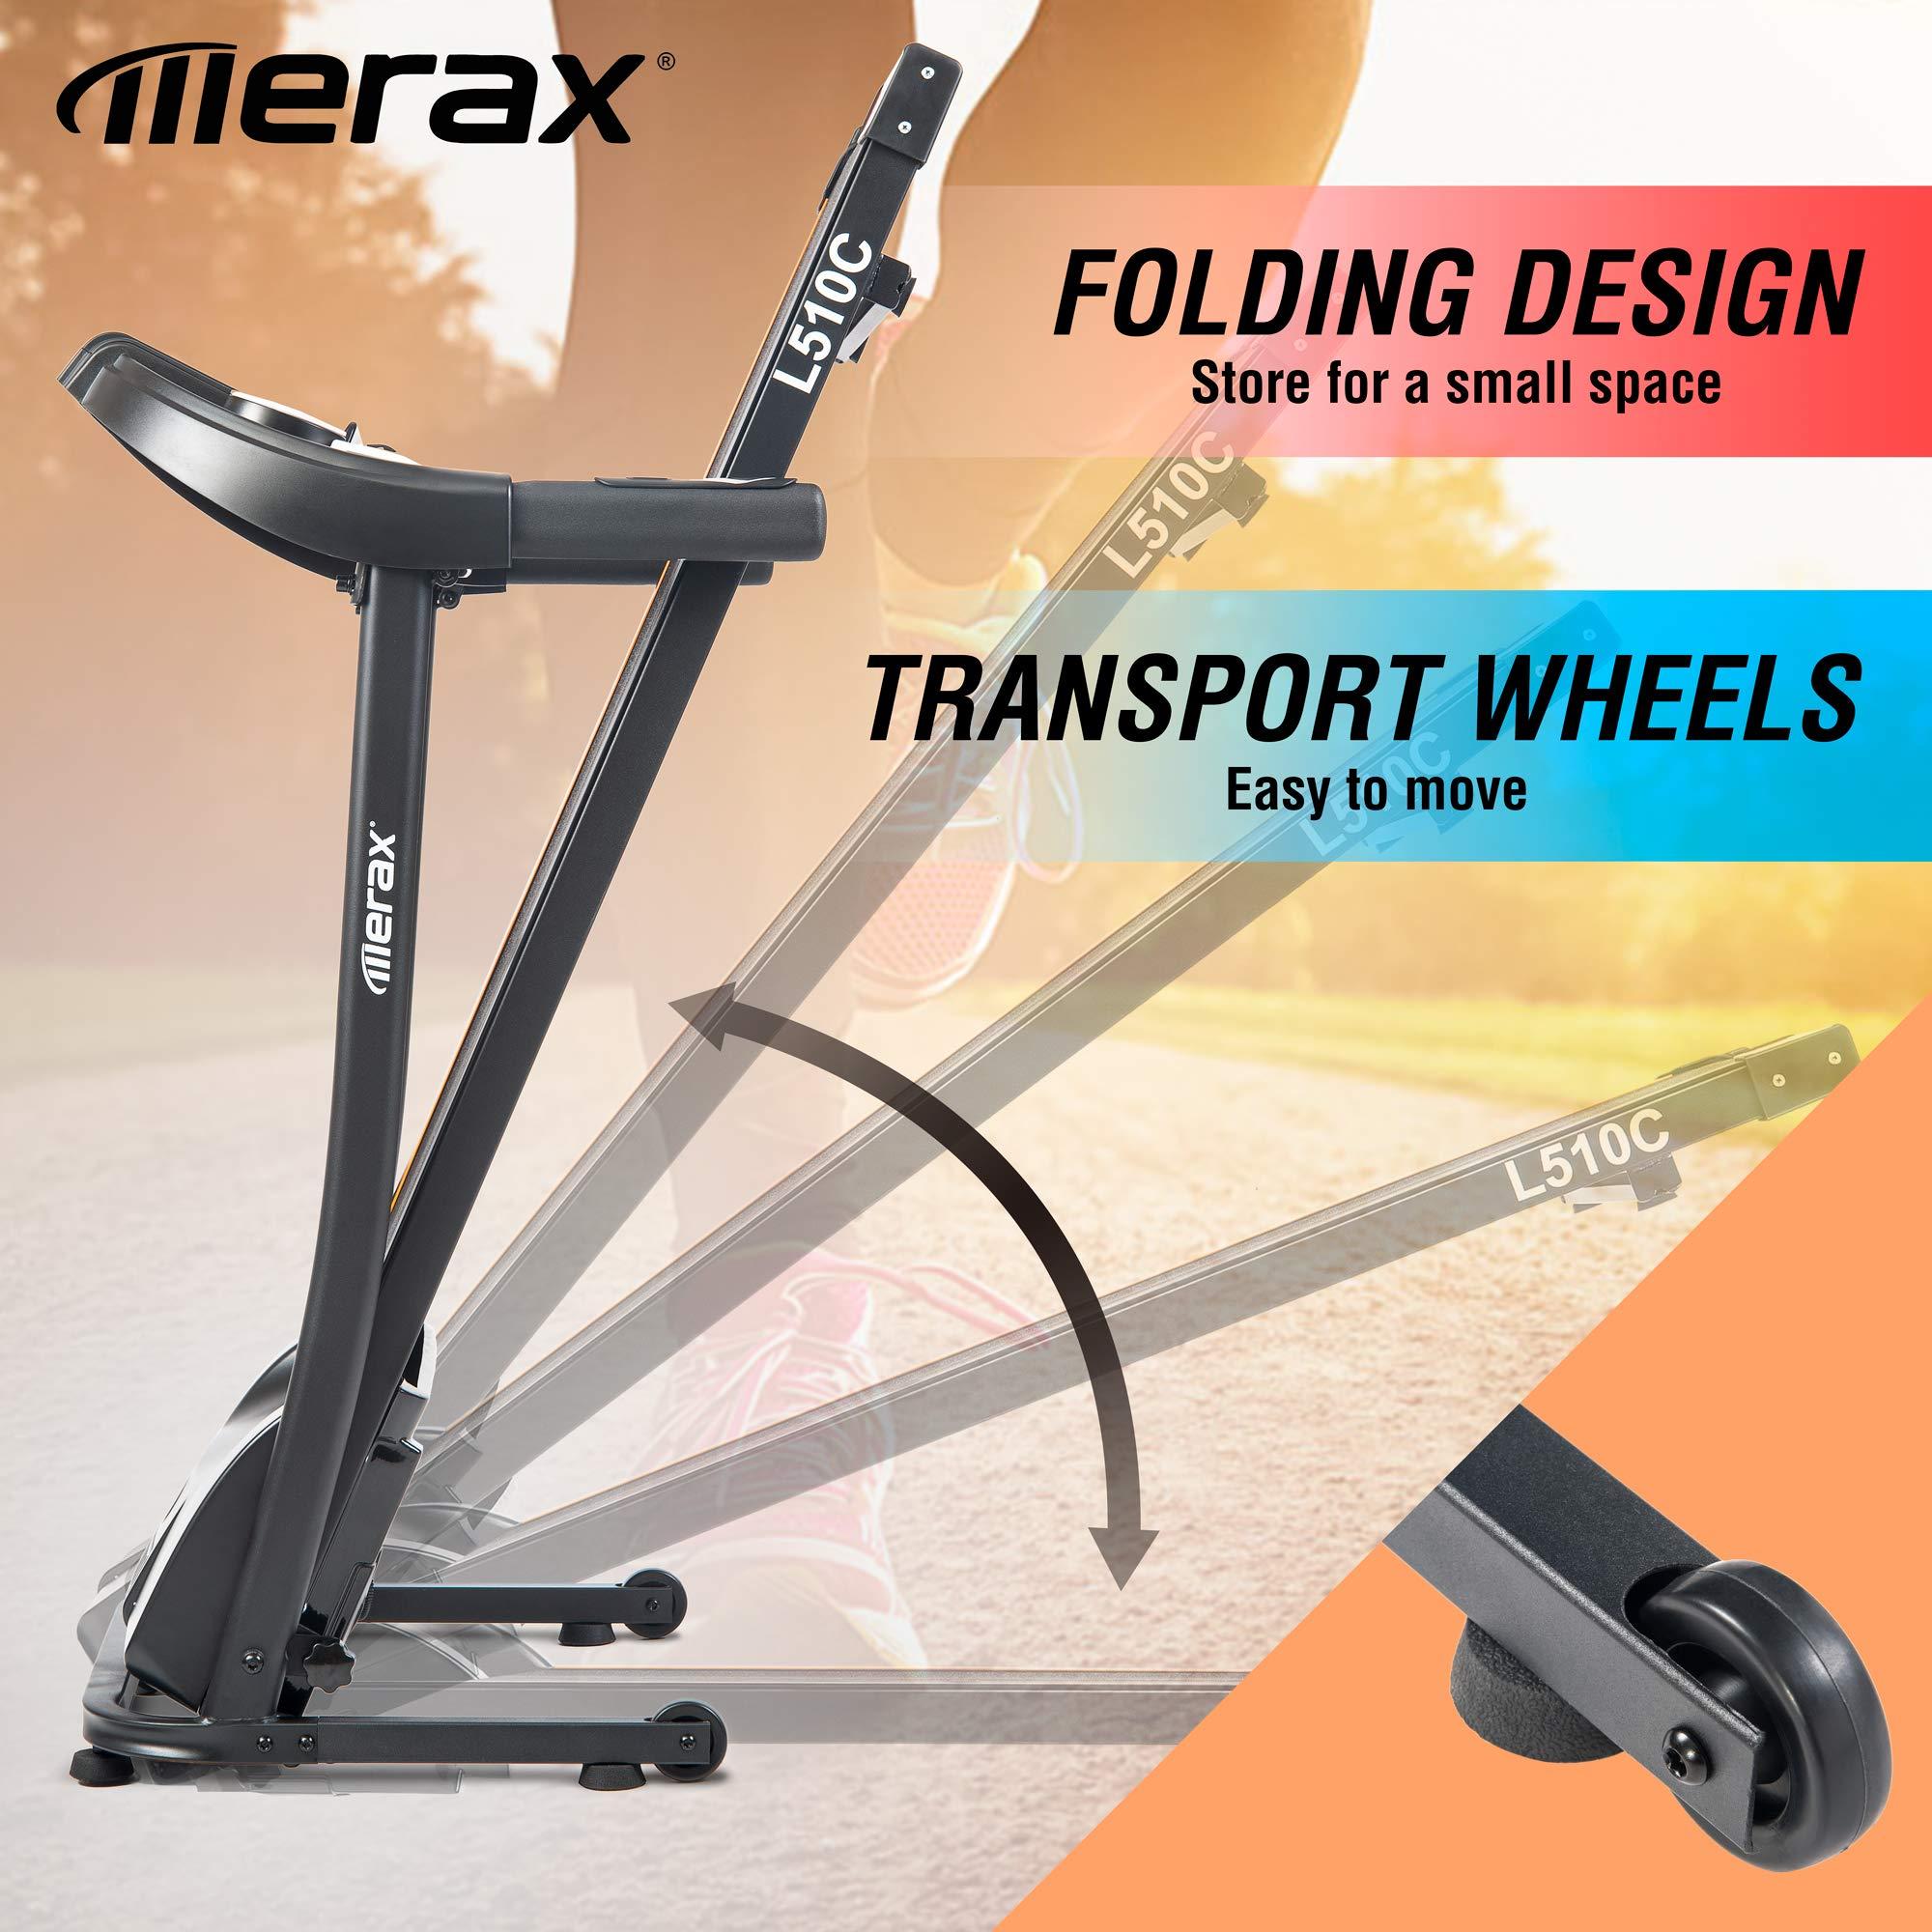 Merax Easy Assembly Folding Electric Treadmill Motorized Running Machine by Merax (Image #4)